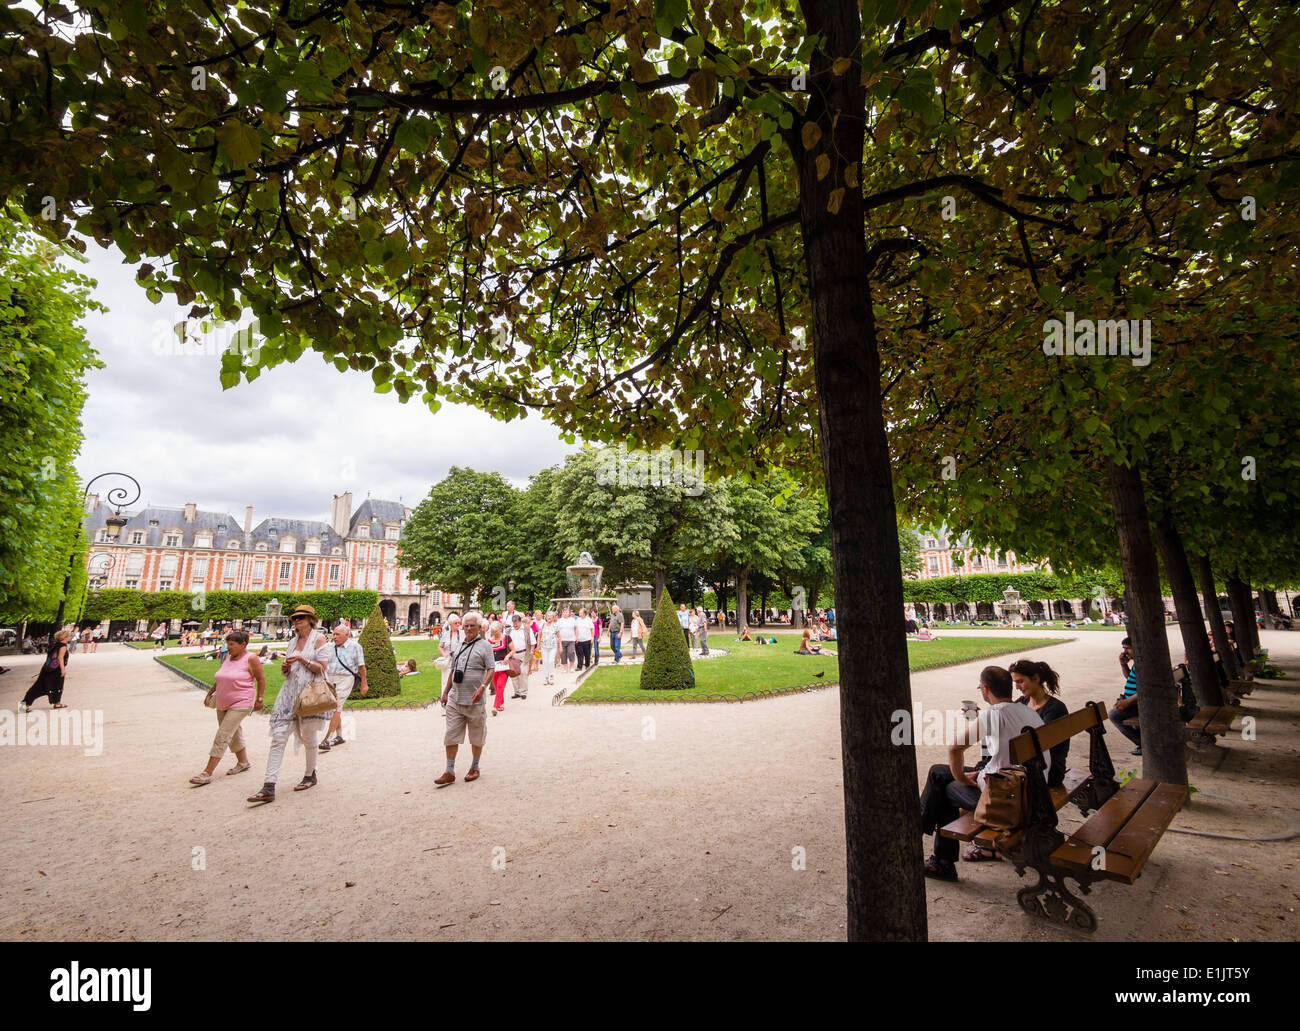 The Place des Vosges in the Marais quarter in Paris. - Stock Image